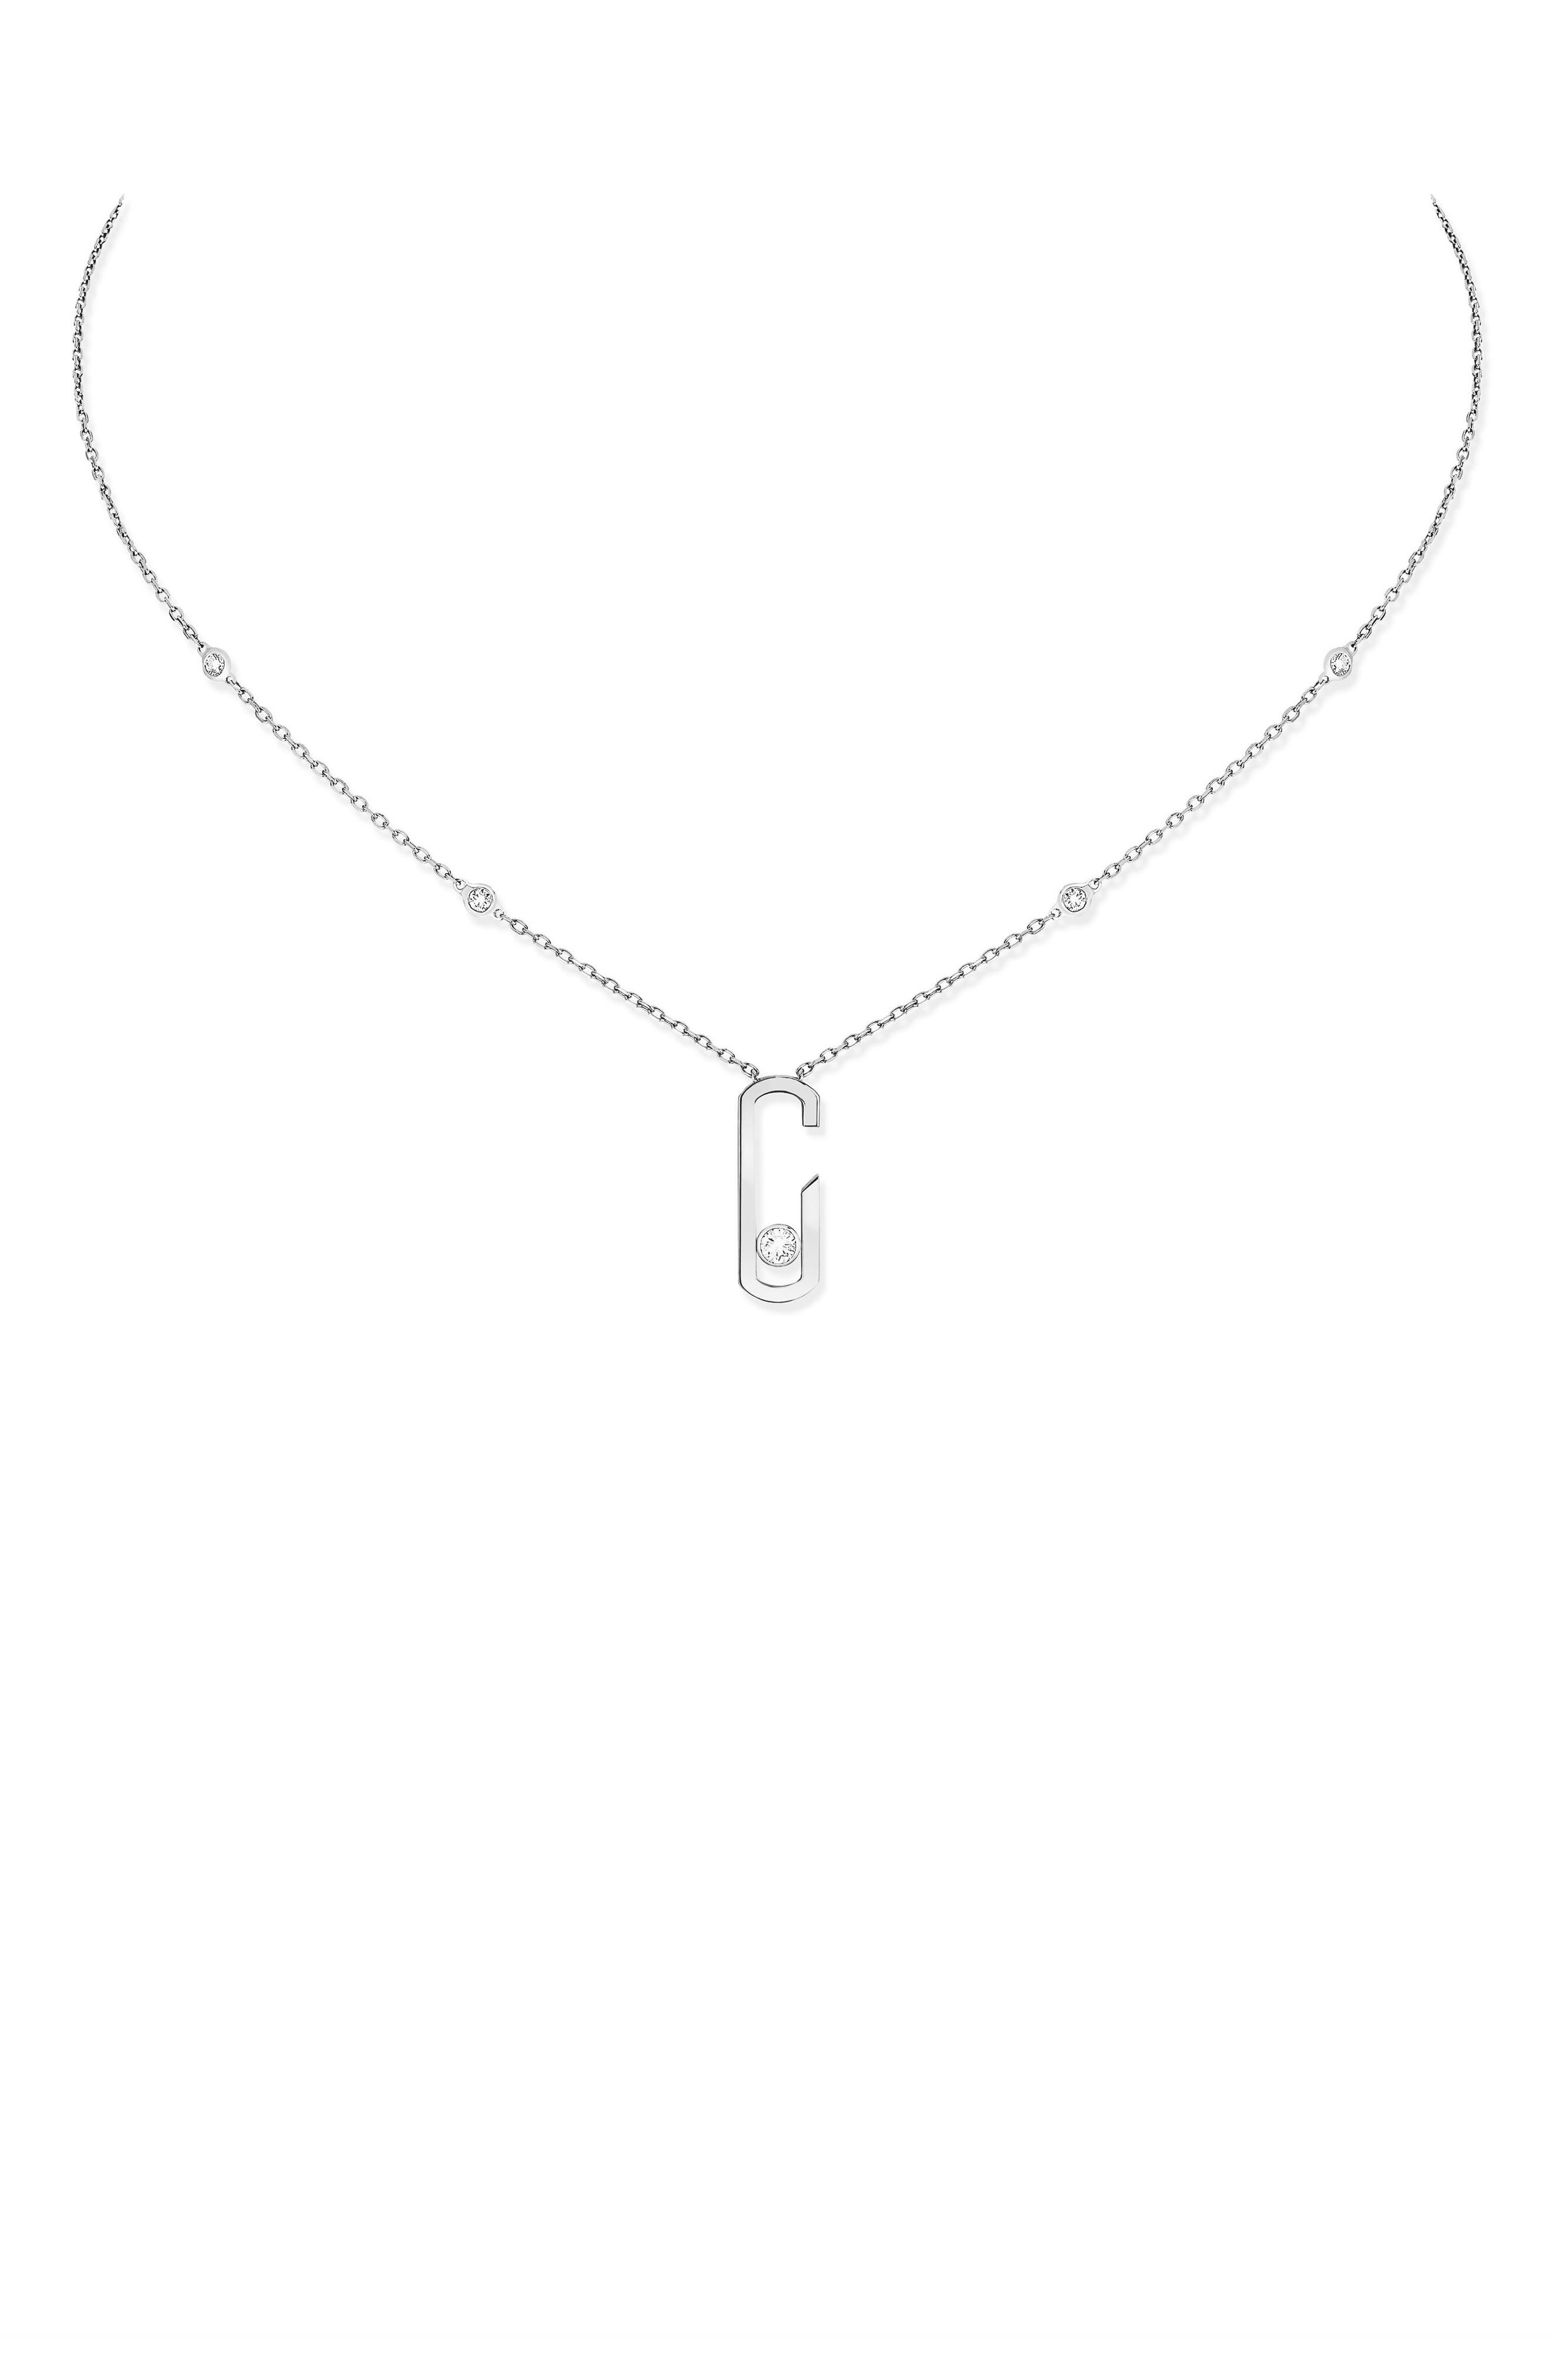 Move Addiction by Gigi Hadid Diamond Station Pendant Necklace,                         Main,                         color, WHITE GOLD